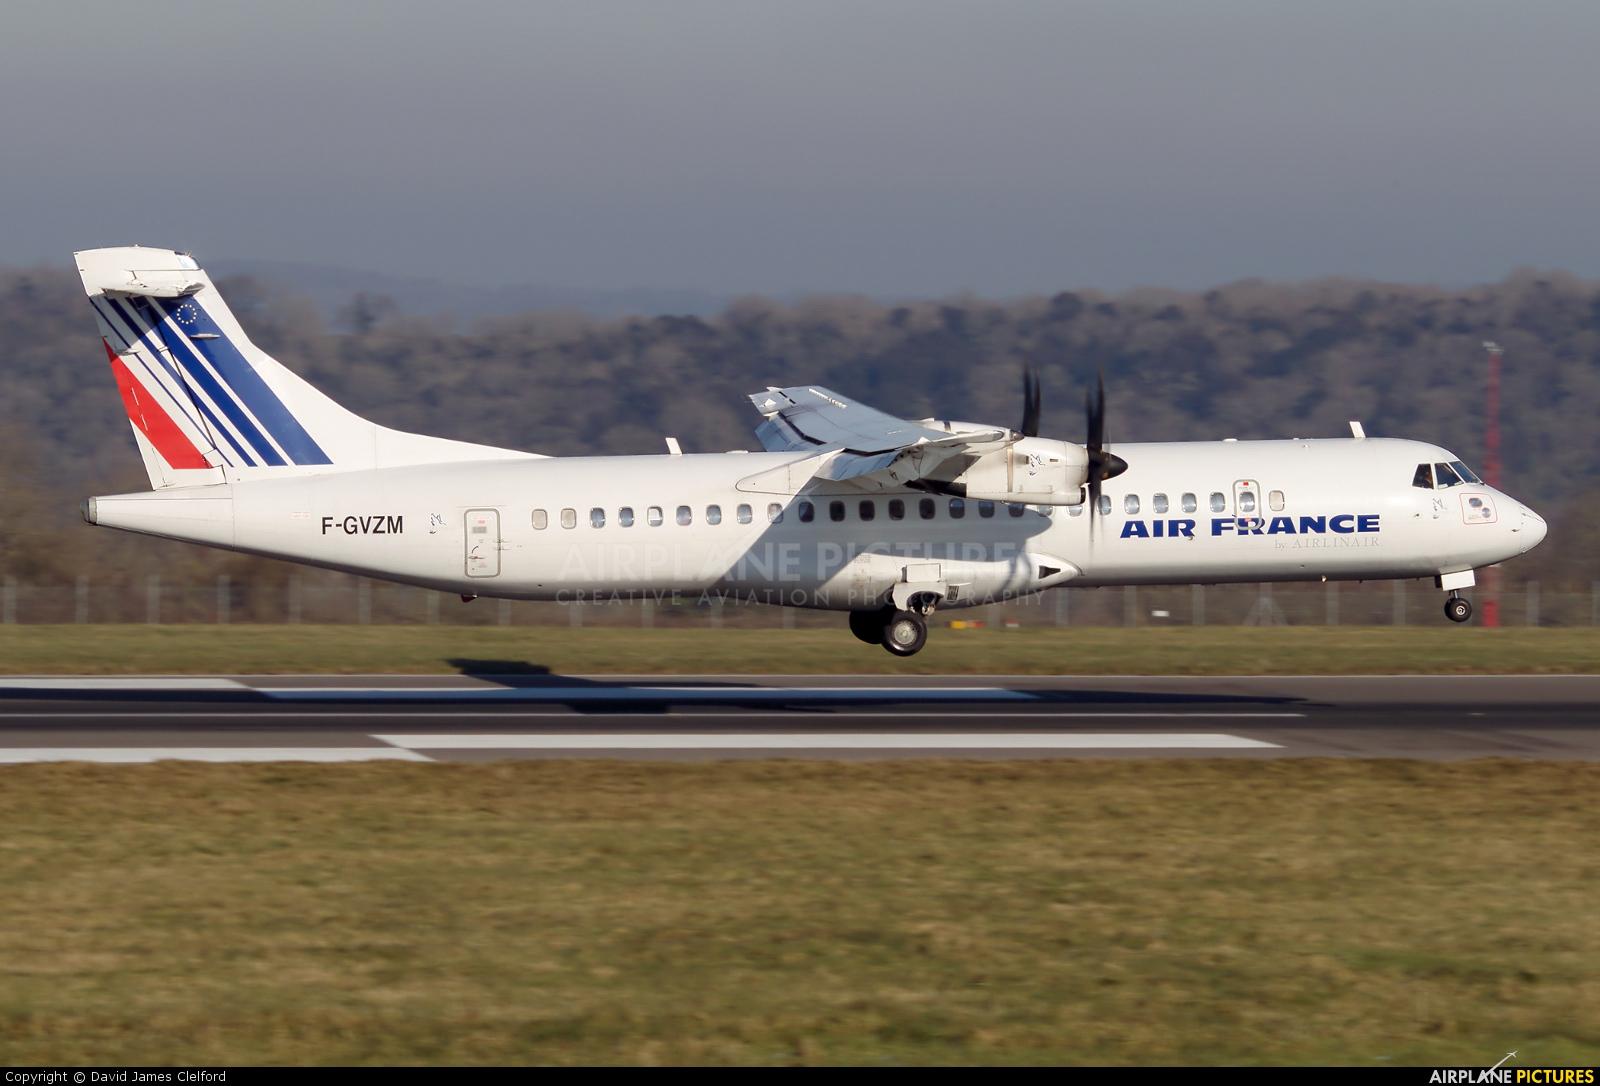 Air France - Airlinair F-GVZM aircraft at Bristol - Lulsgate